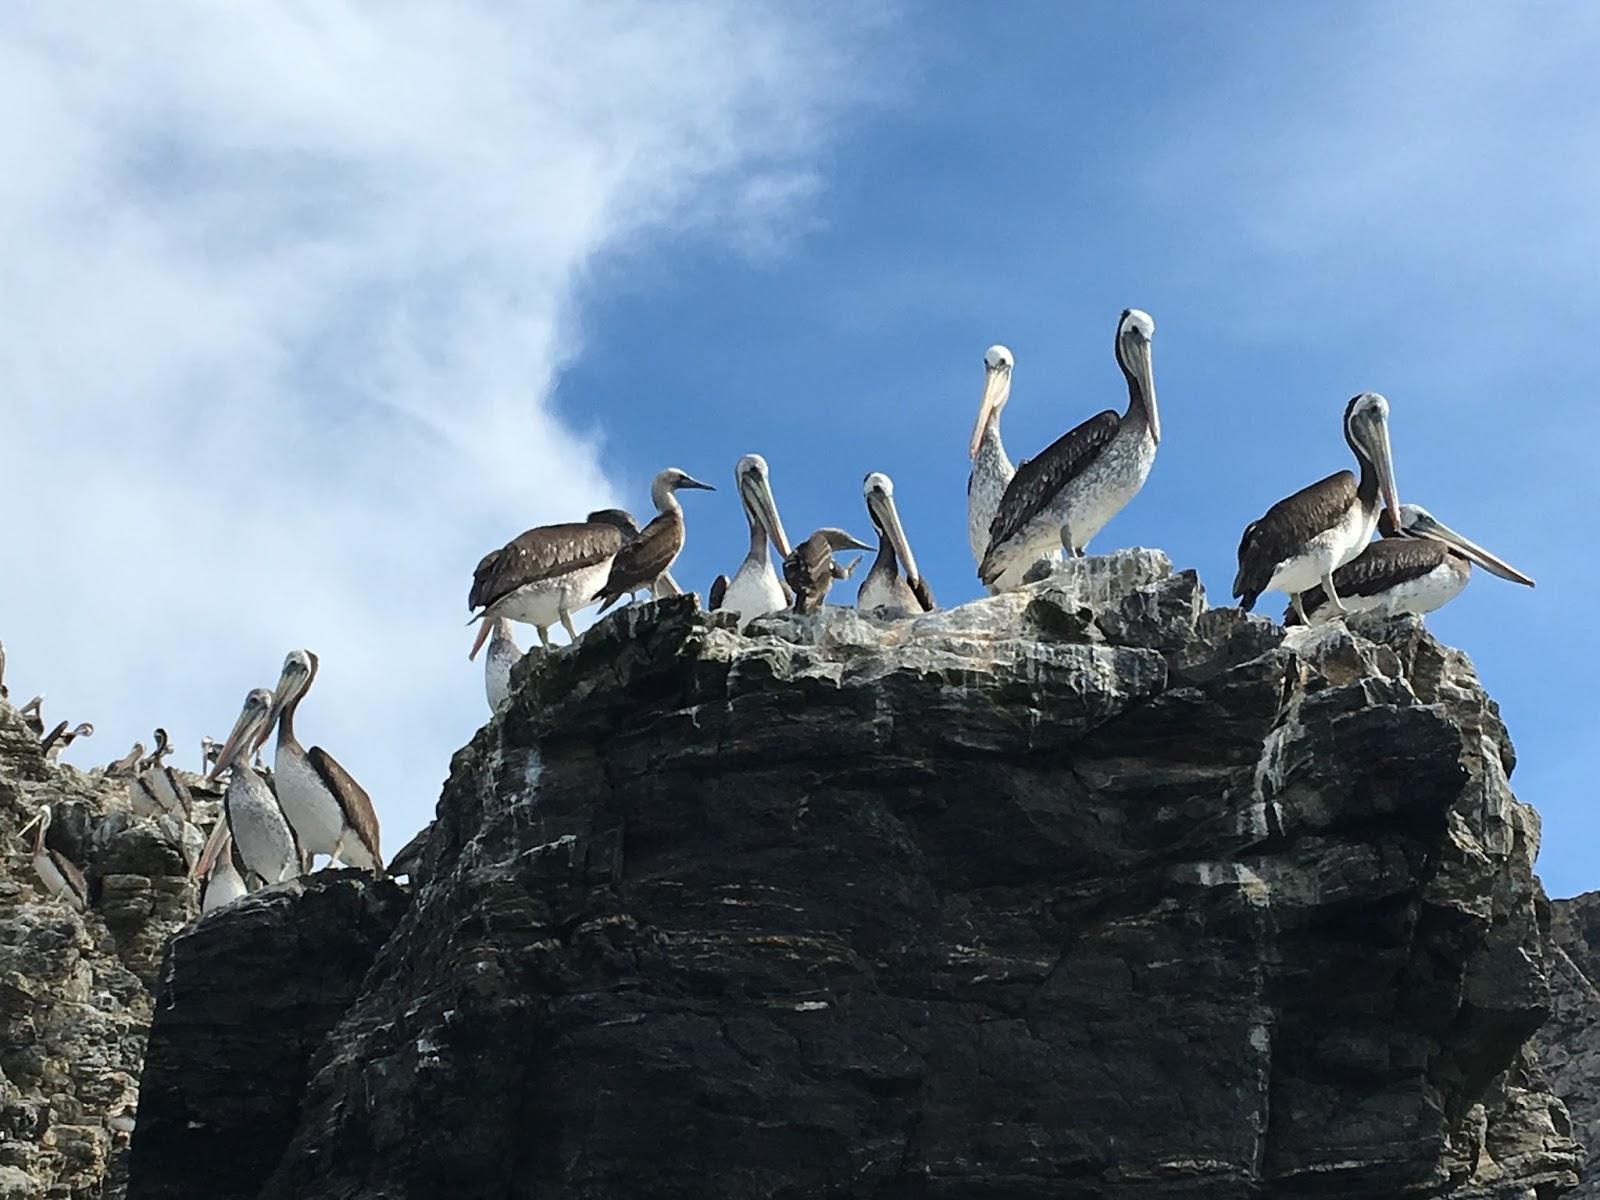 Humbolt Penguin Reserve {Chile}